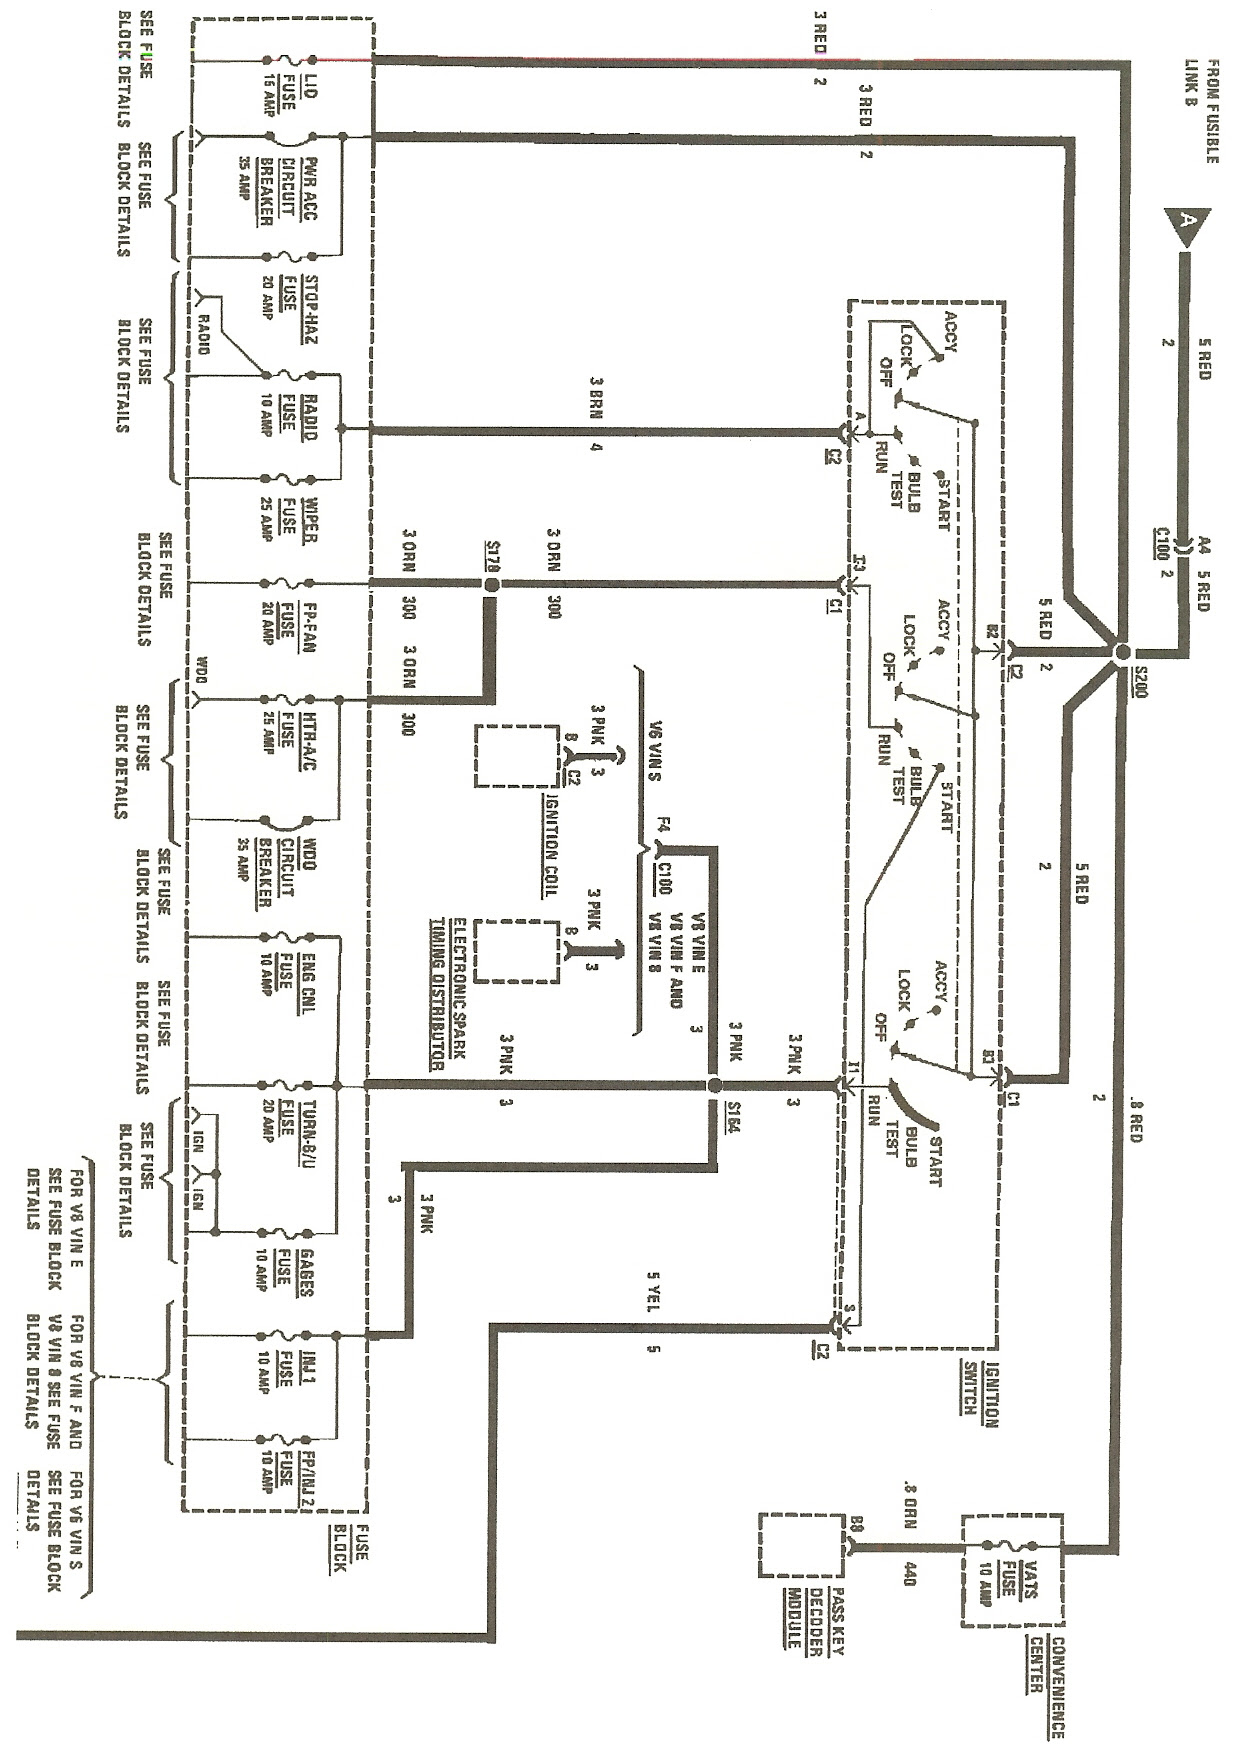 85 steering column wiring diagram ford truck 32 gm steering column wiring diagram wiring diagram list  32 gm steering column wiring diagram